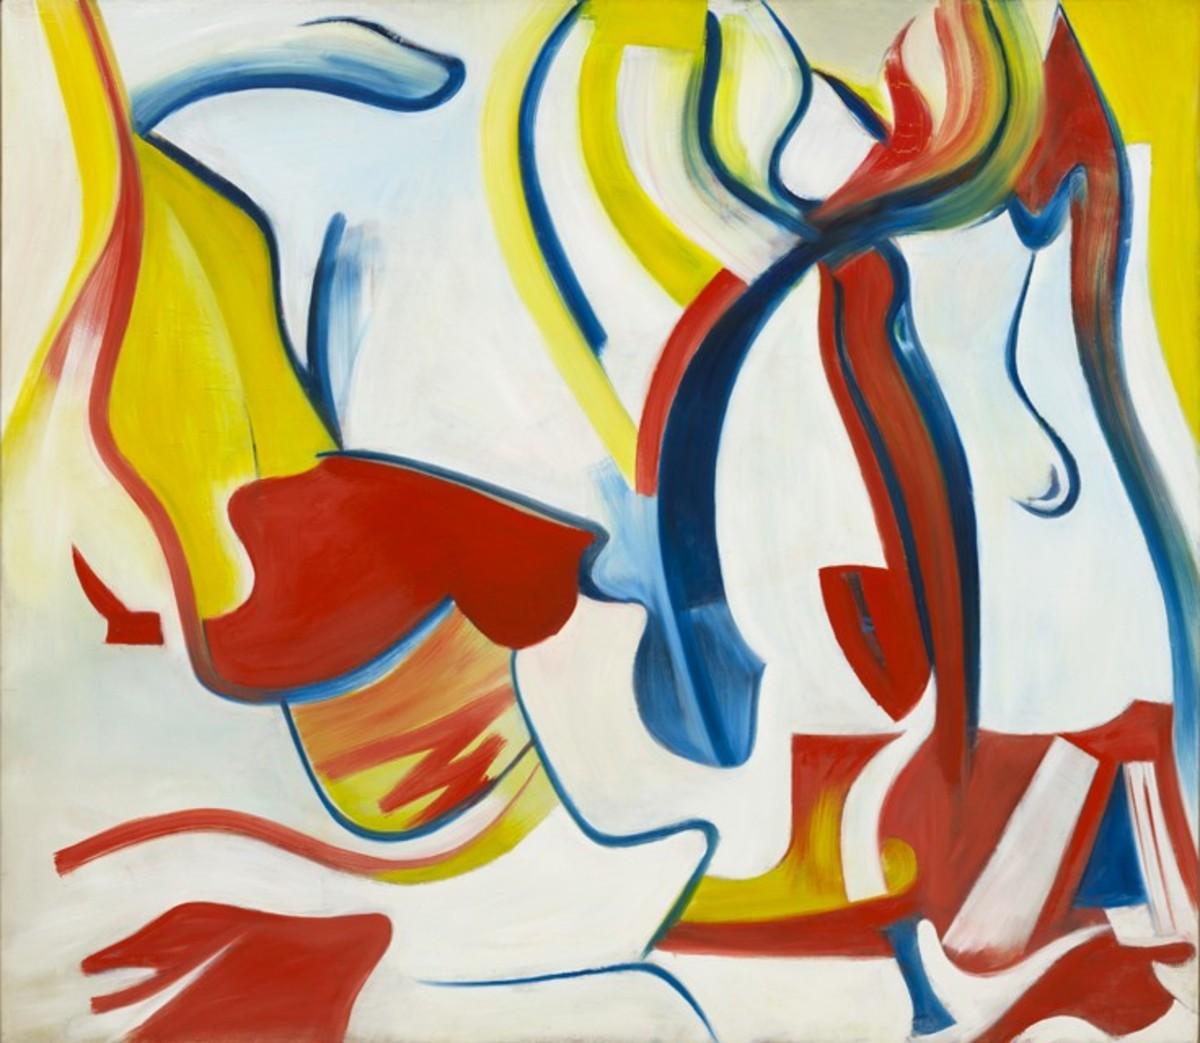 Untitled VII (1985)